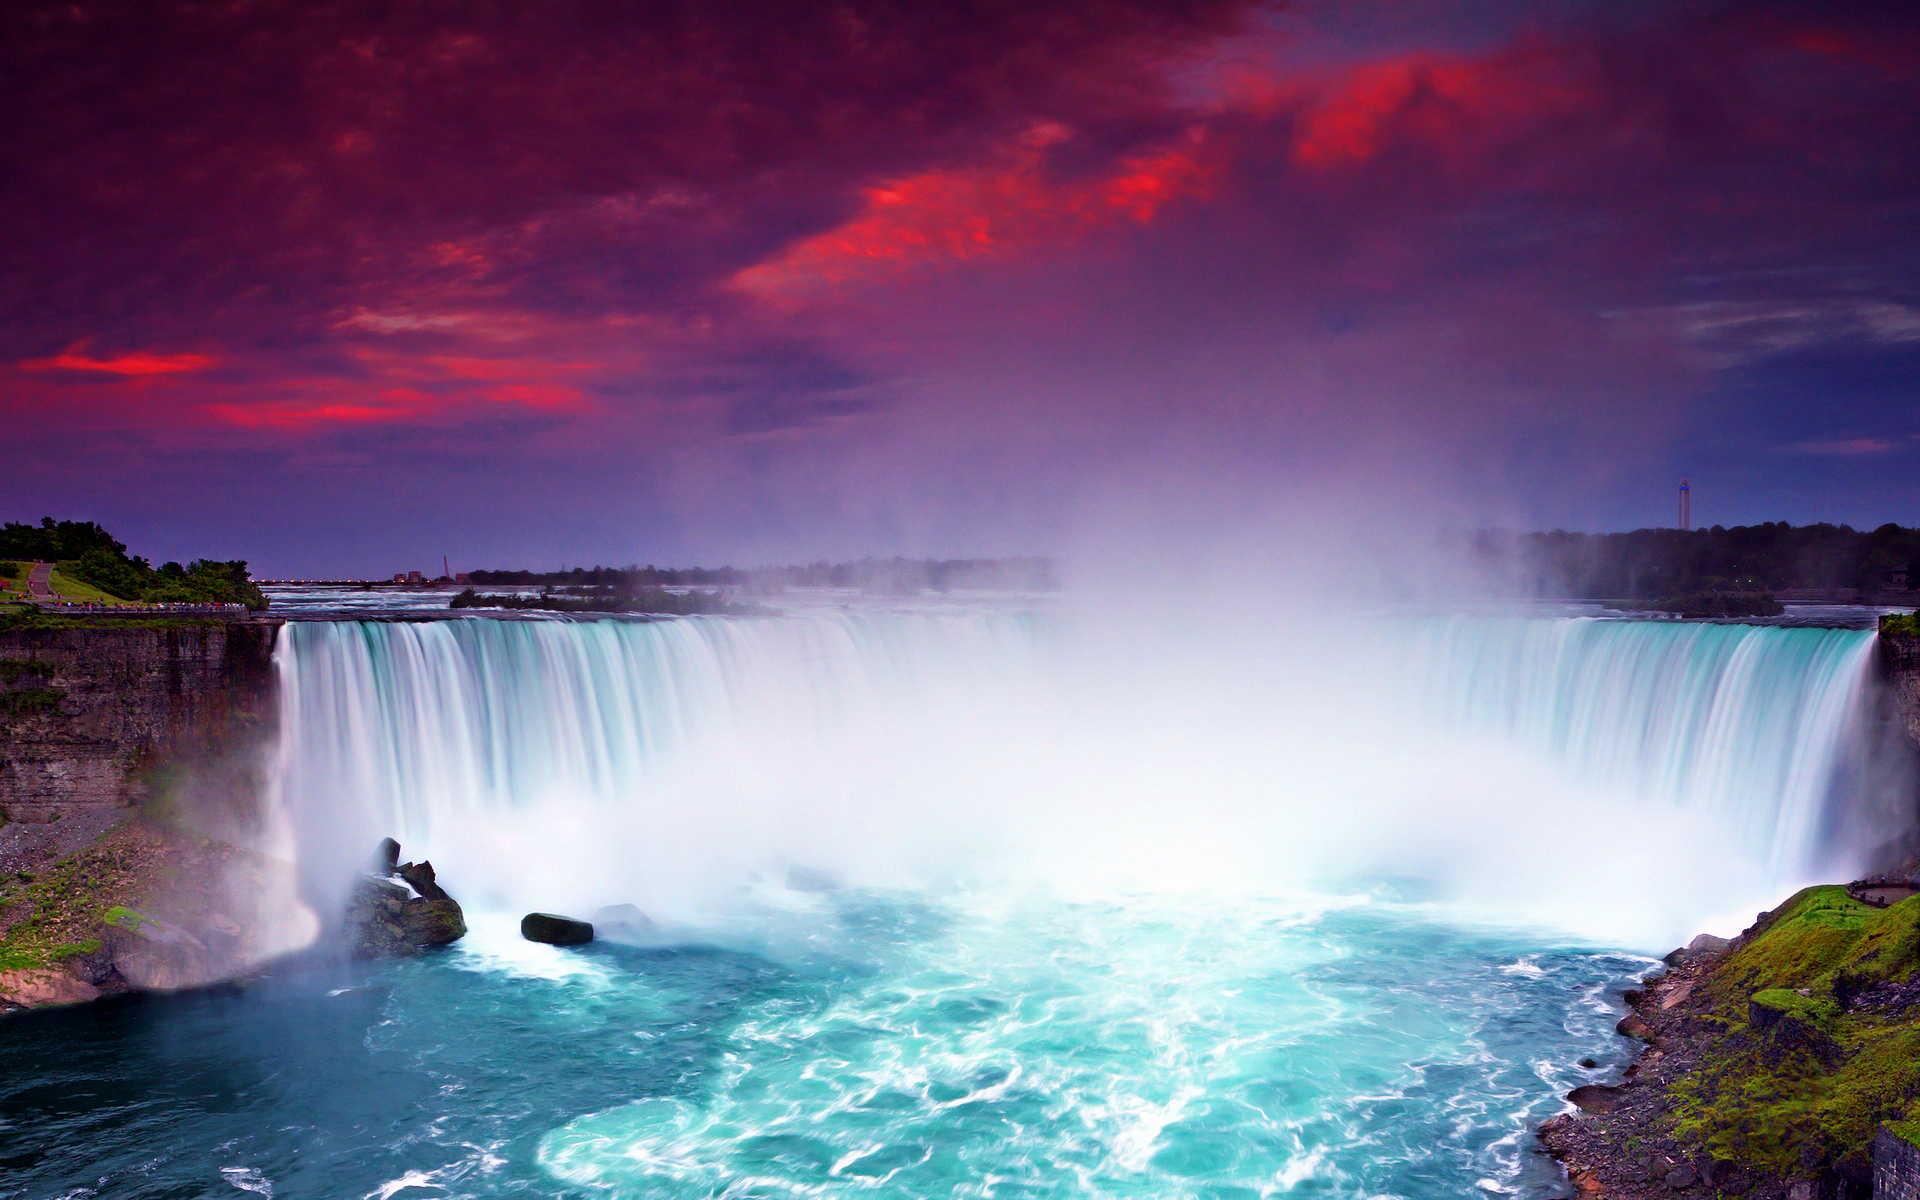 Niagara Falls Wallpaper   Wallpaper High Definition High Quality 1920x1200